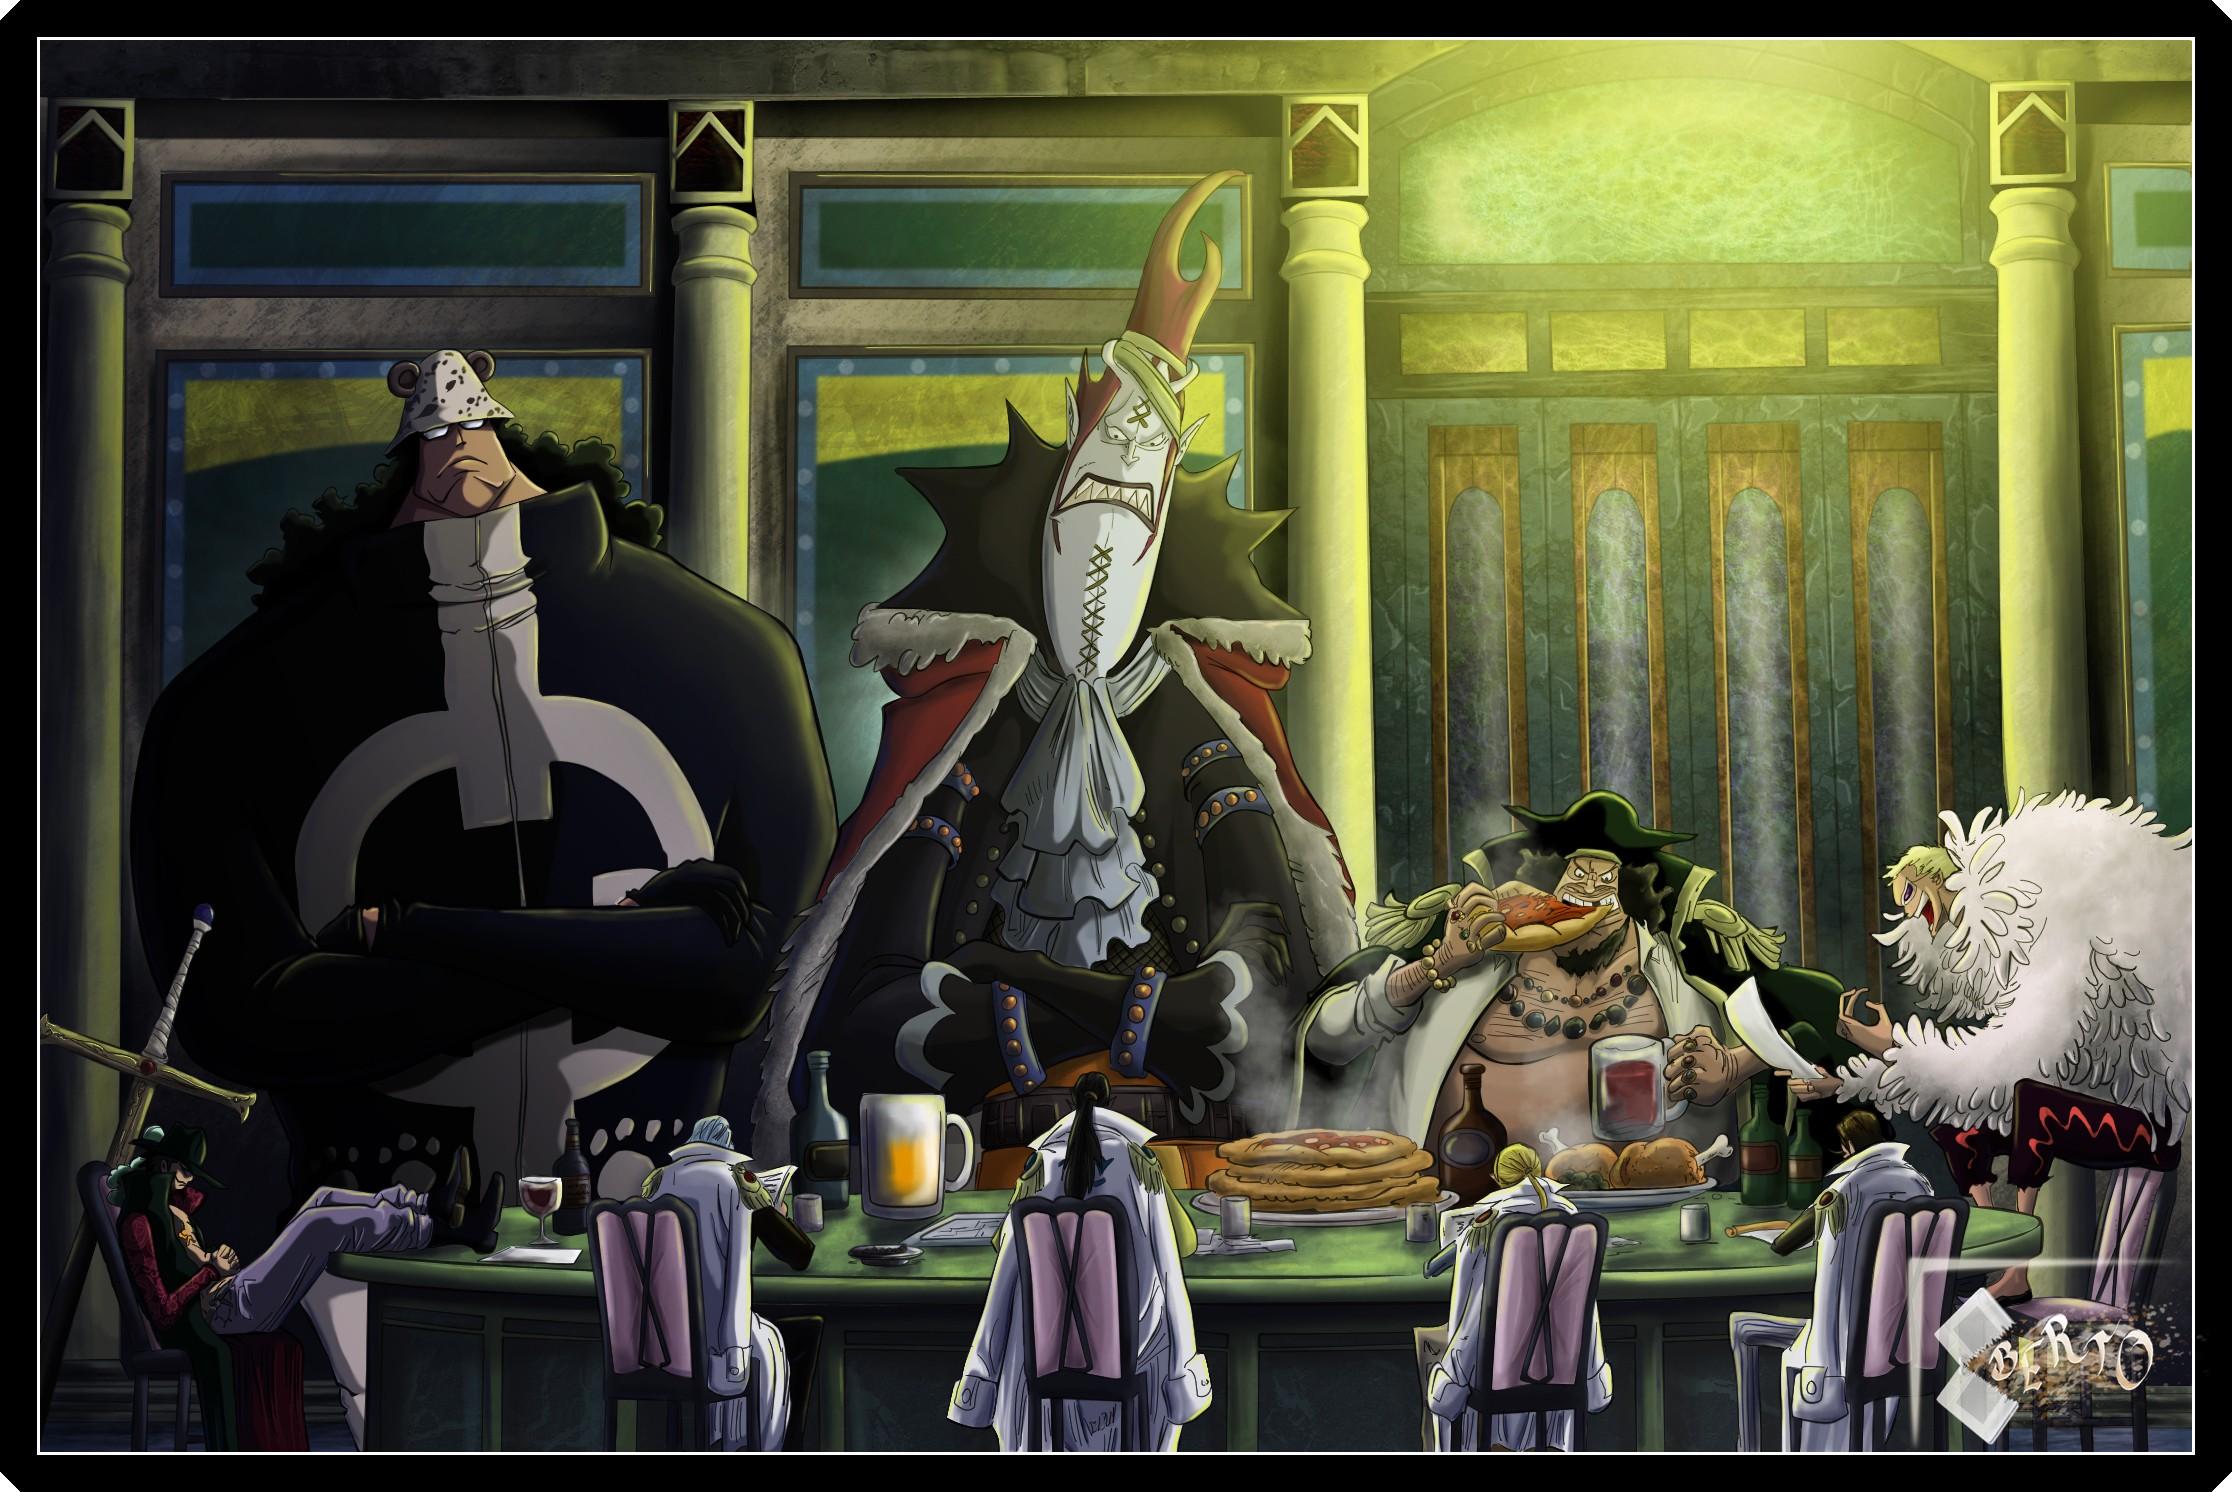 Wallpaper Anime One Piece Games Screenshot Pc Game